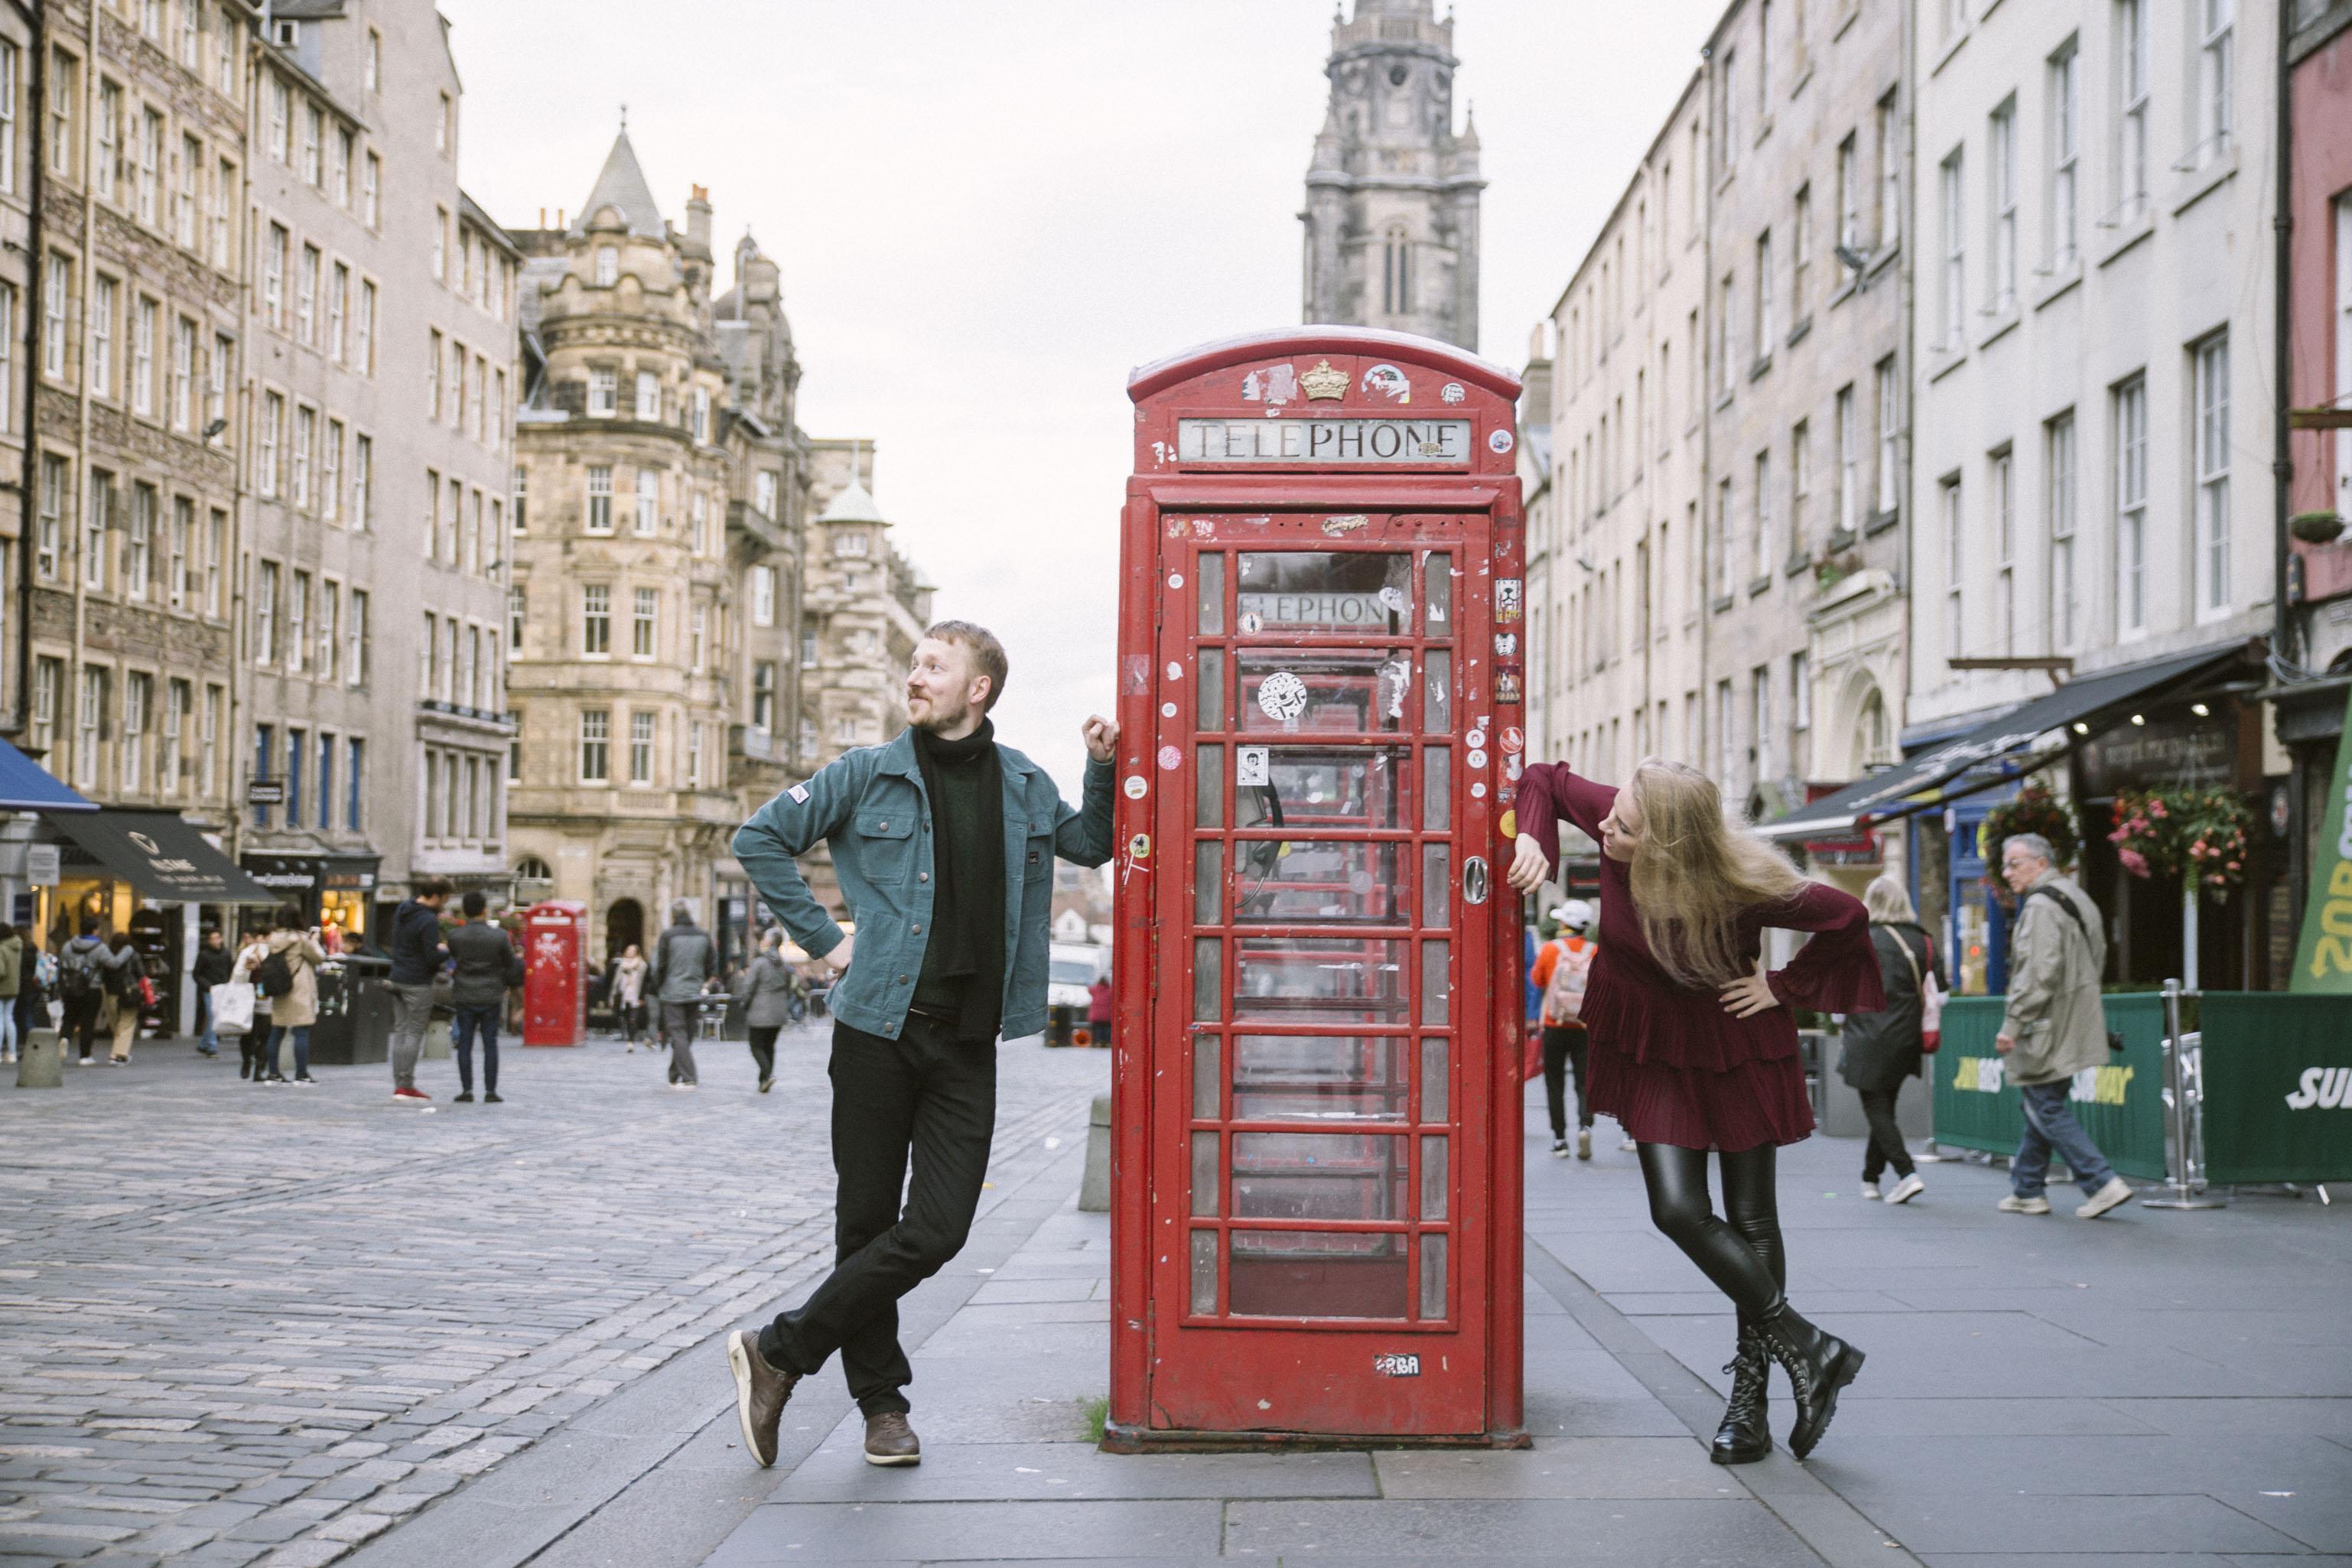 Lovers in Edinburgh, Scottish Proposal, Royal Mile, Red Phone Box, Wedding Photography, Romantic Edinburgh Street Old Town Couple Photoshoot | Pre Wedding Photography | Engagement Portraits Scotland | Destination Elopement | Elope in Edinburgh | Couple | Ceranna Photography | Romantic Natural Light Photographer